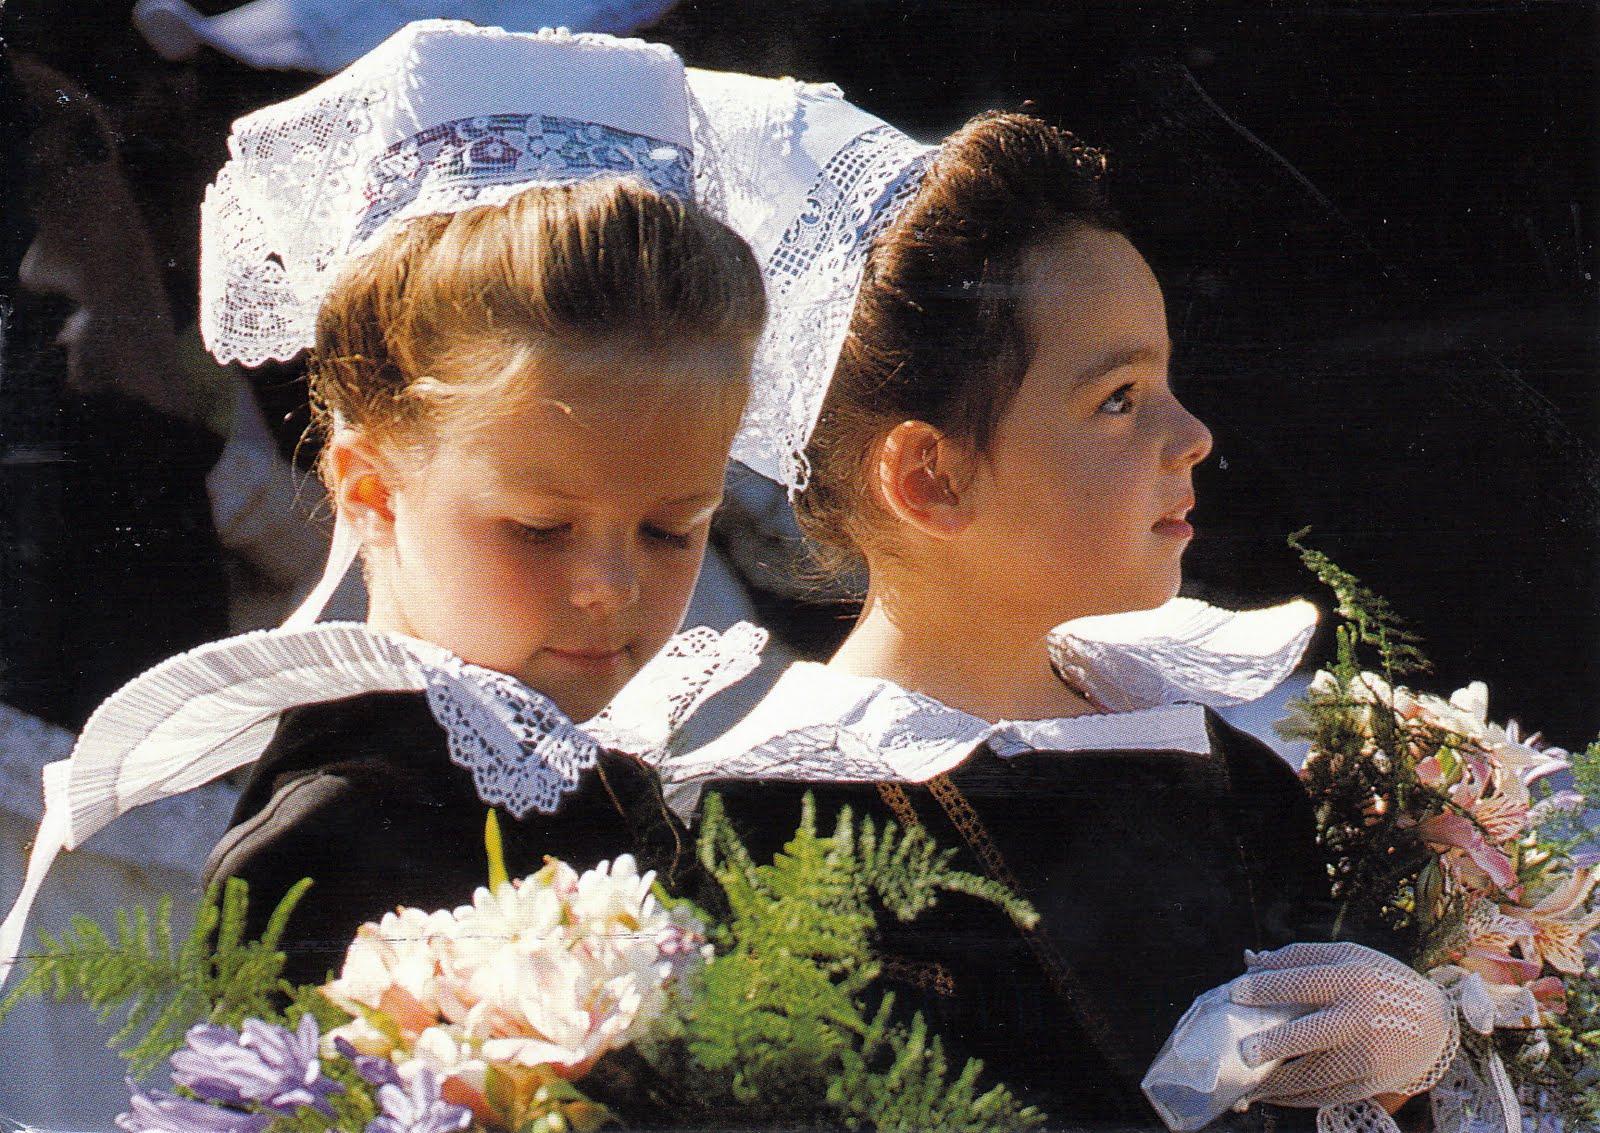 breton traditional dress